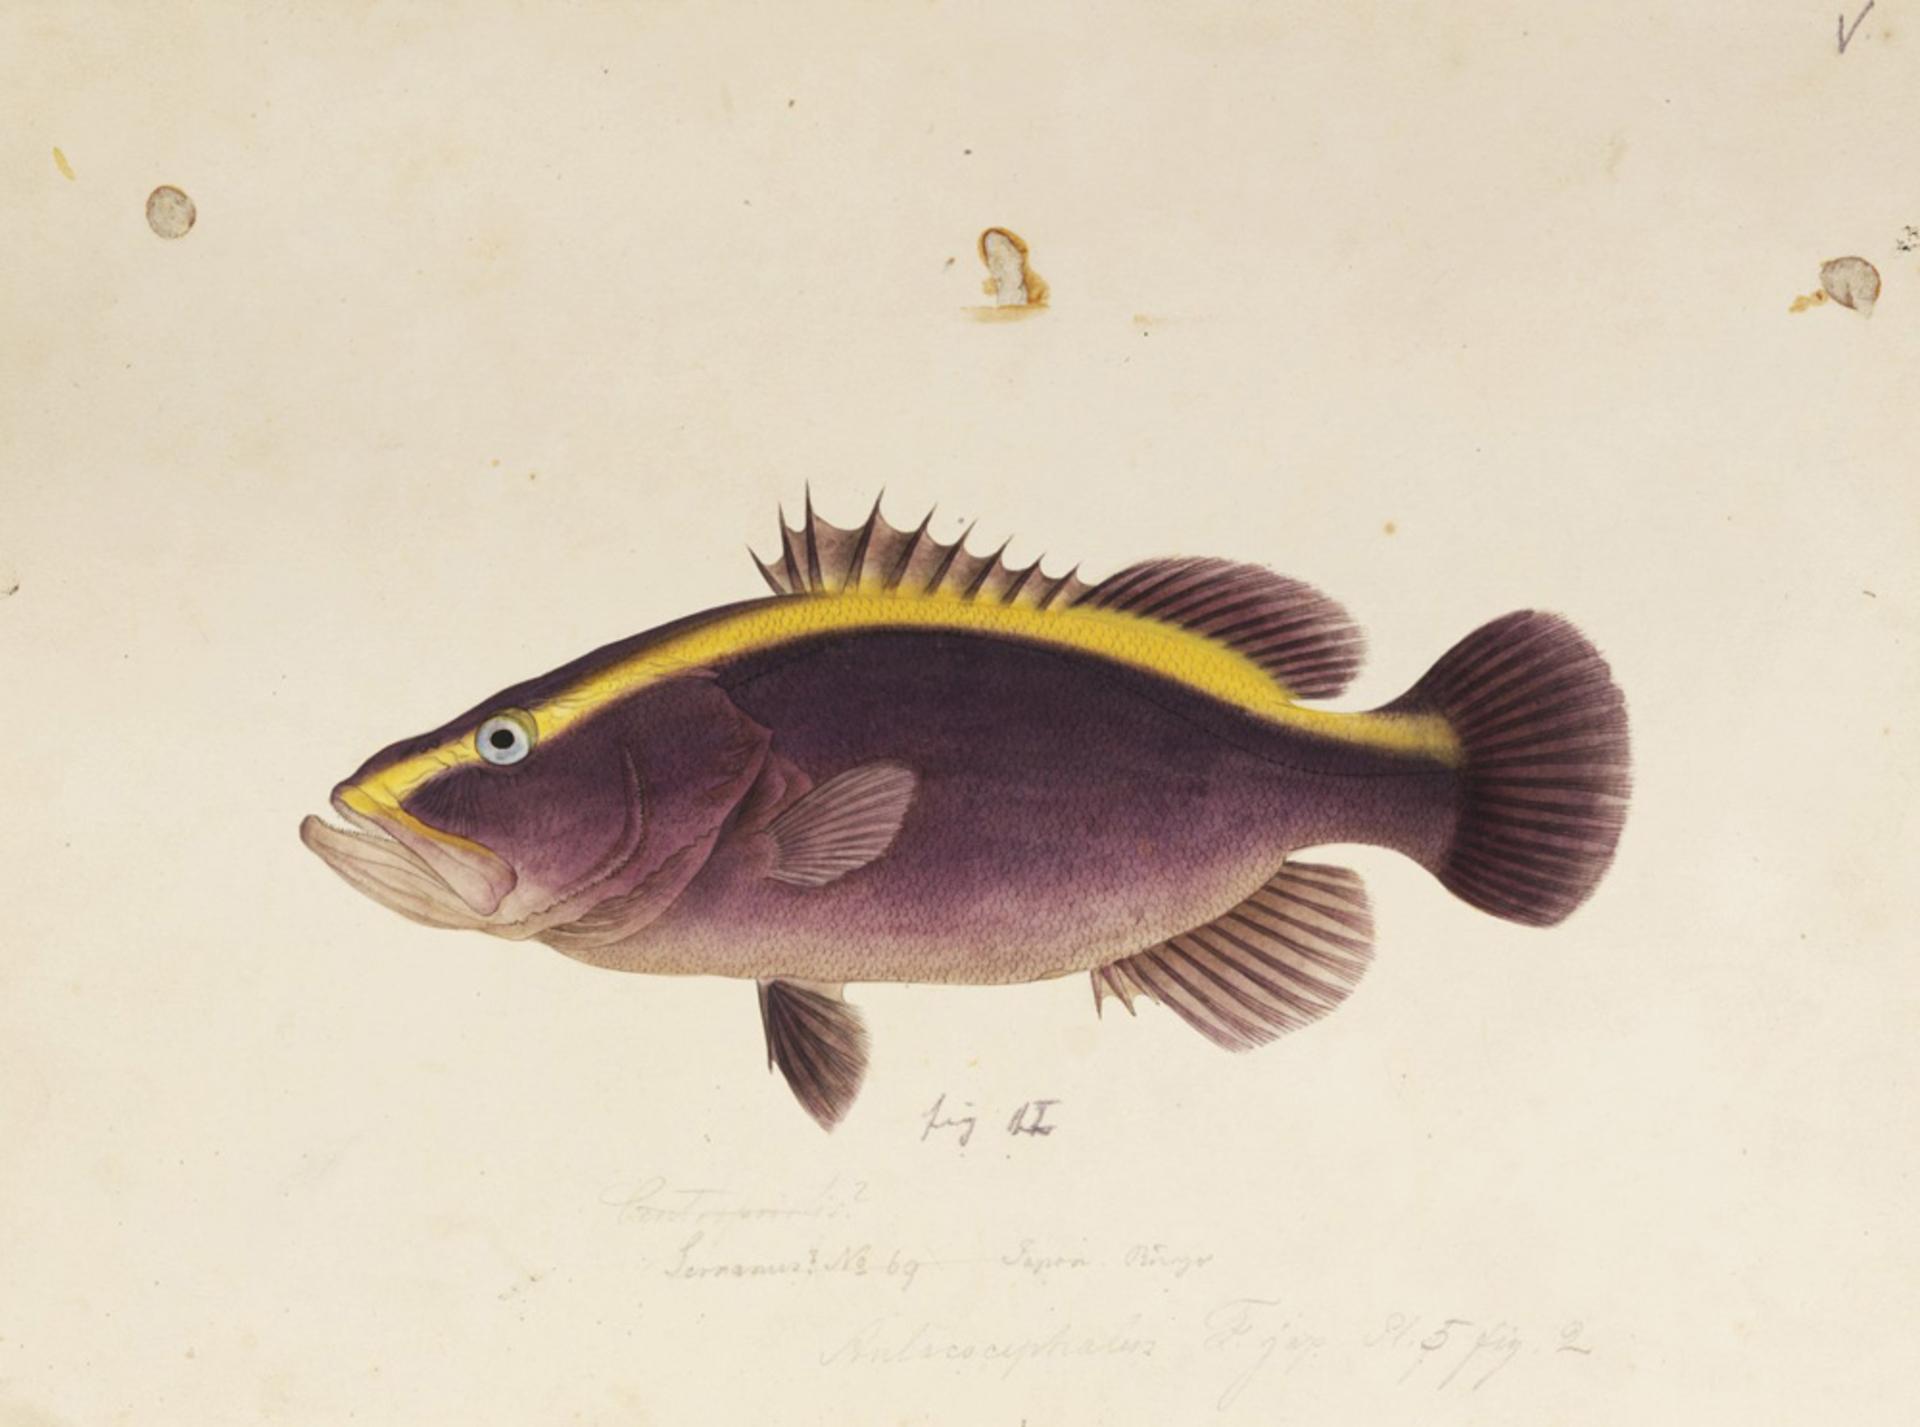 RMNH.ART.672 | Aulacocephalus temminckii